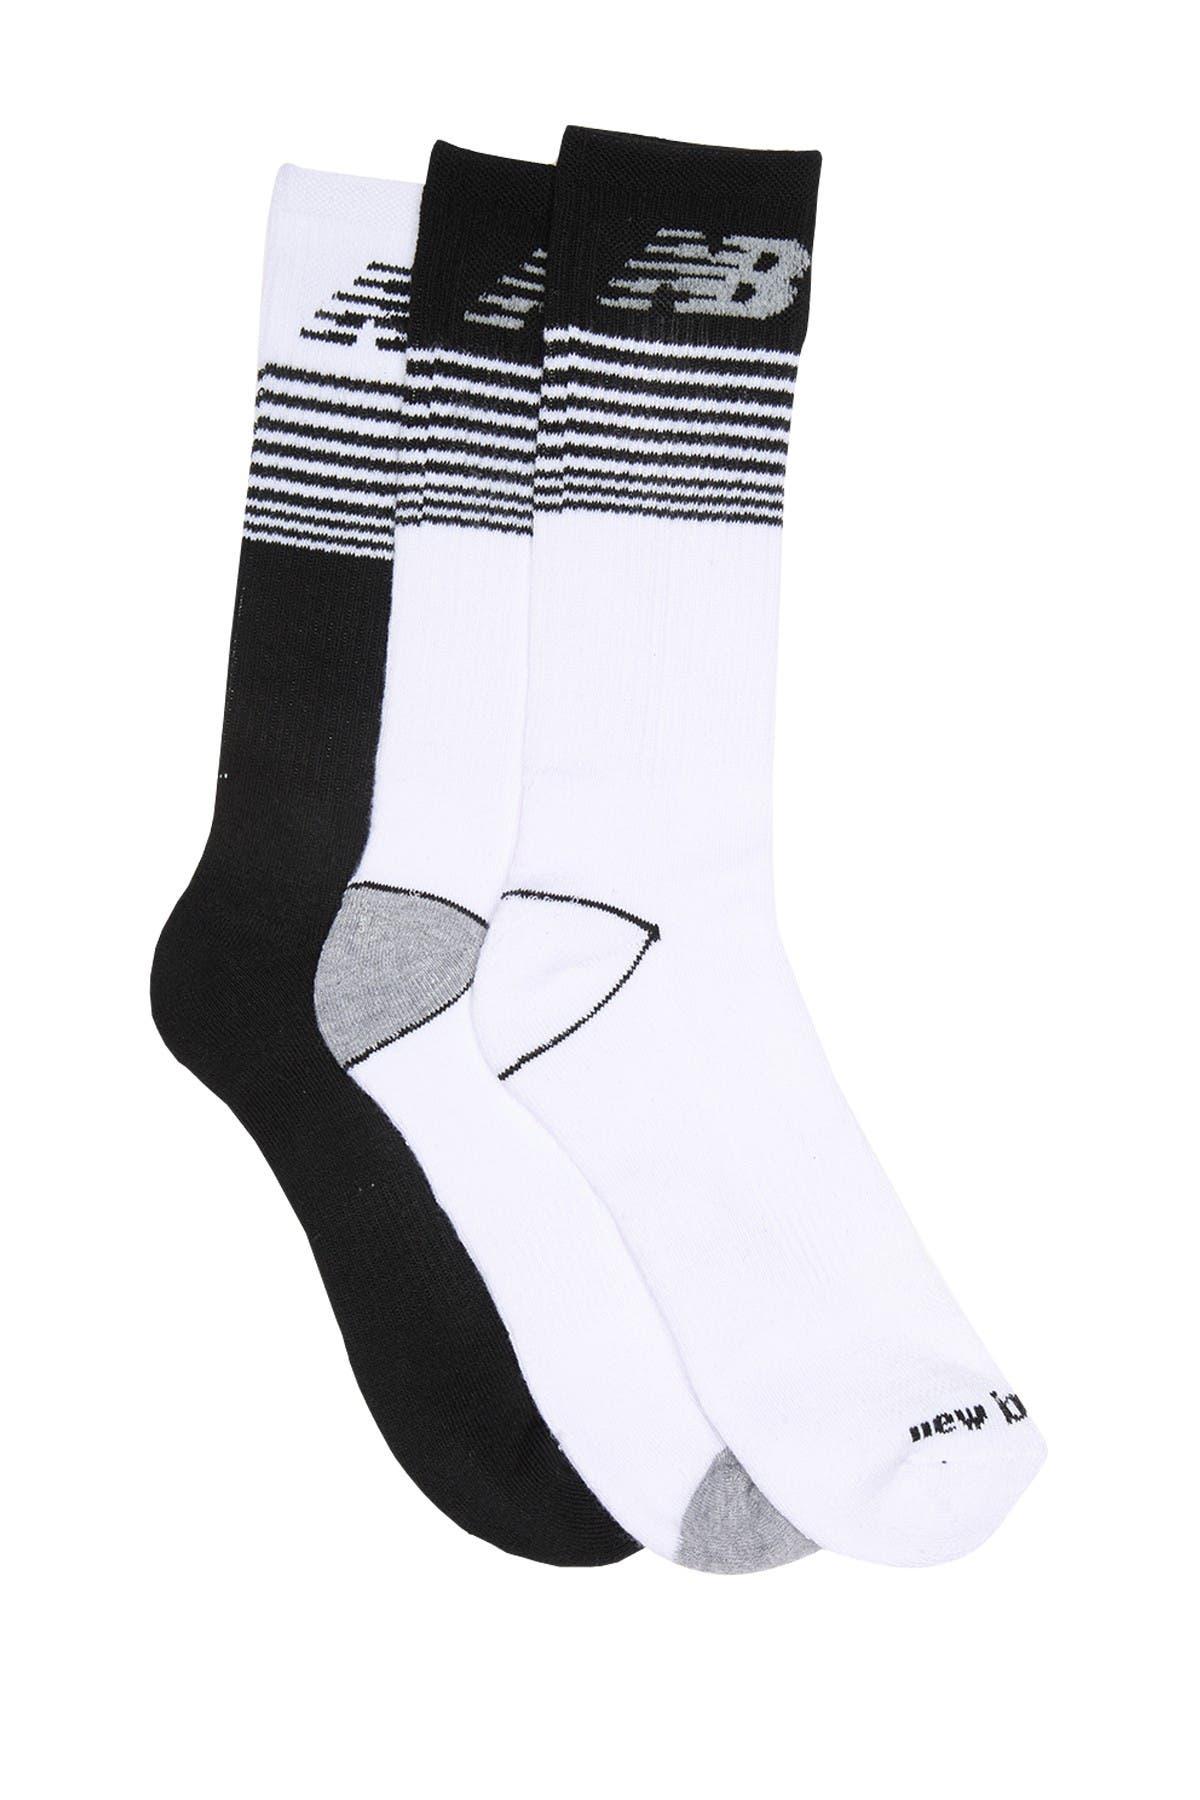 Image of New Balance Logo Stripe Crew Socks - 3 Pack